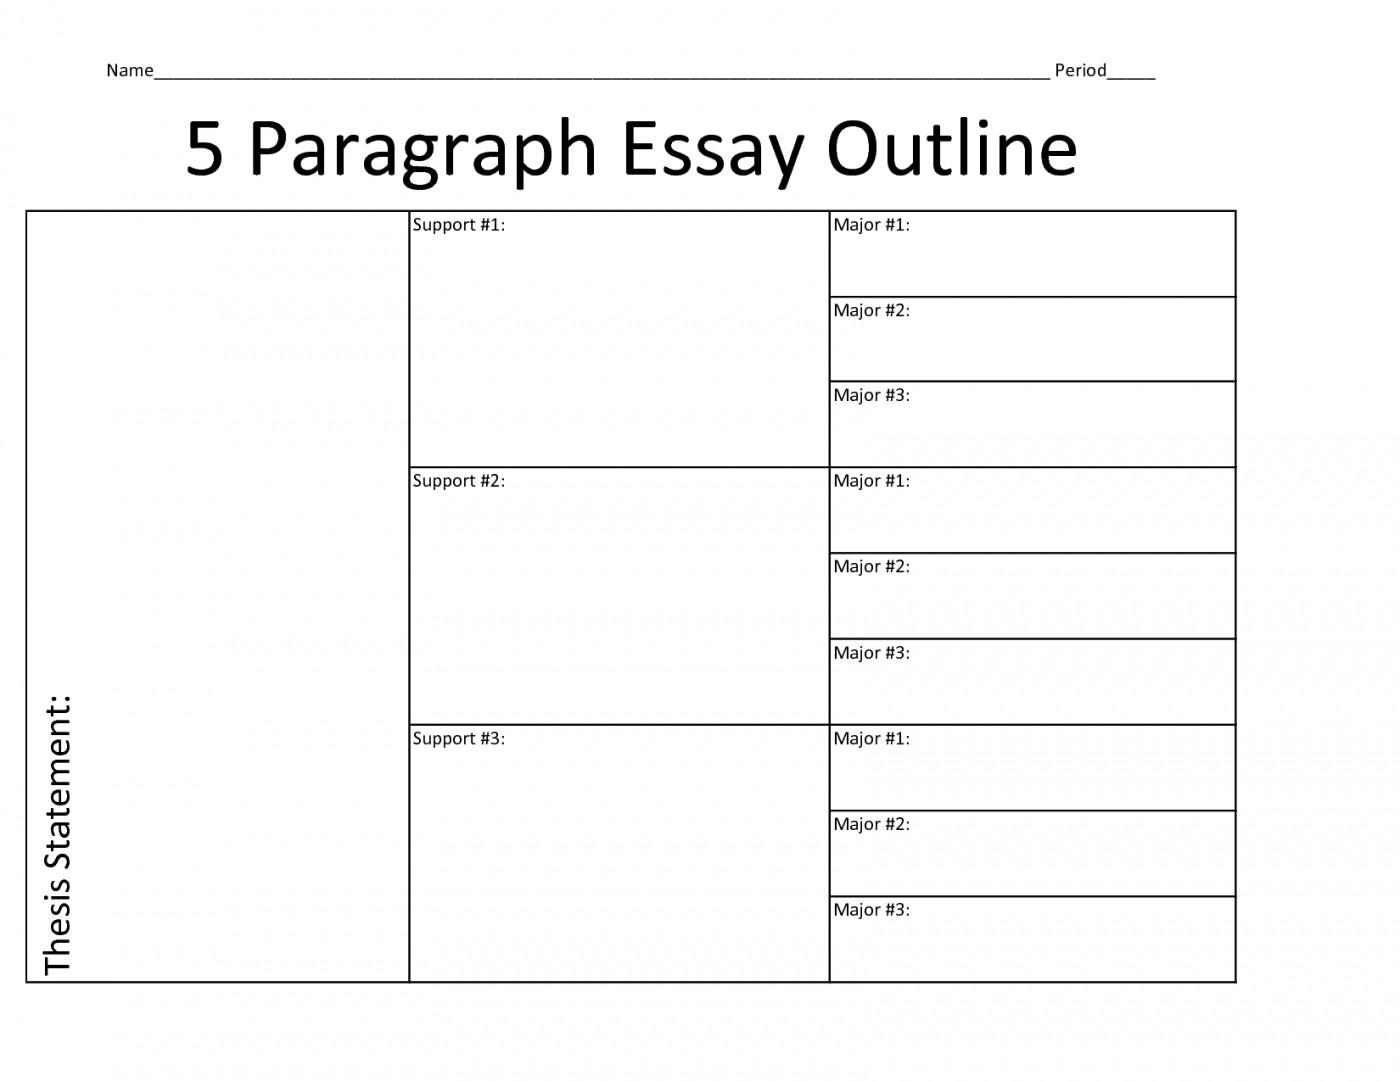 009 Essay Example Template Excellent Outline Mla Argumentative High School Research Paper Pdf 1400